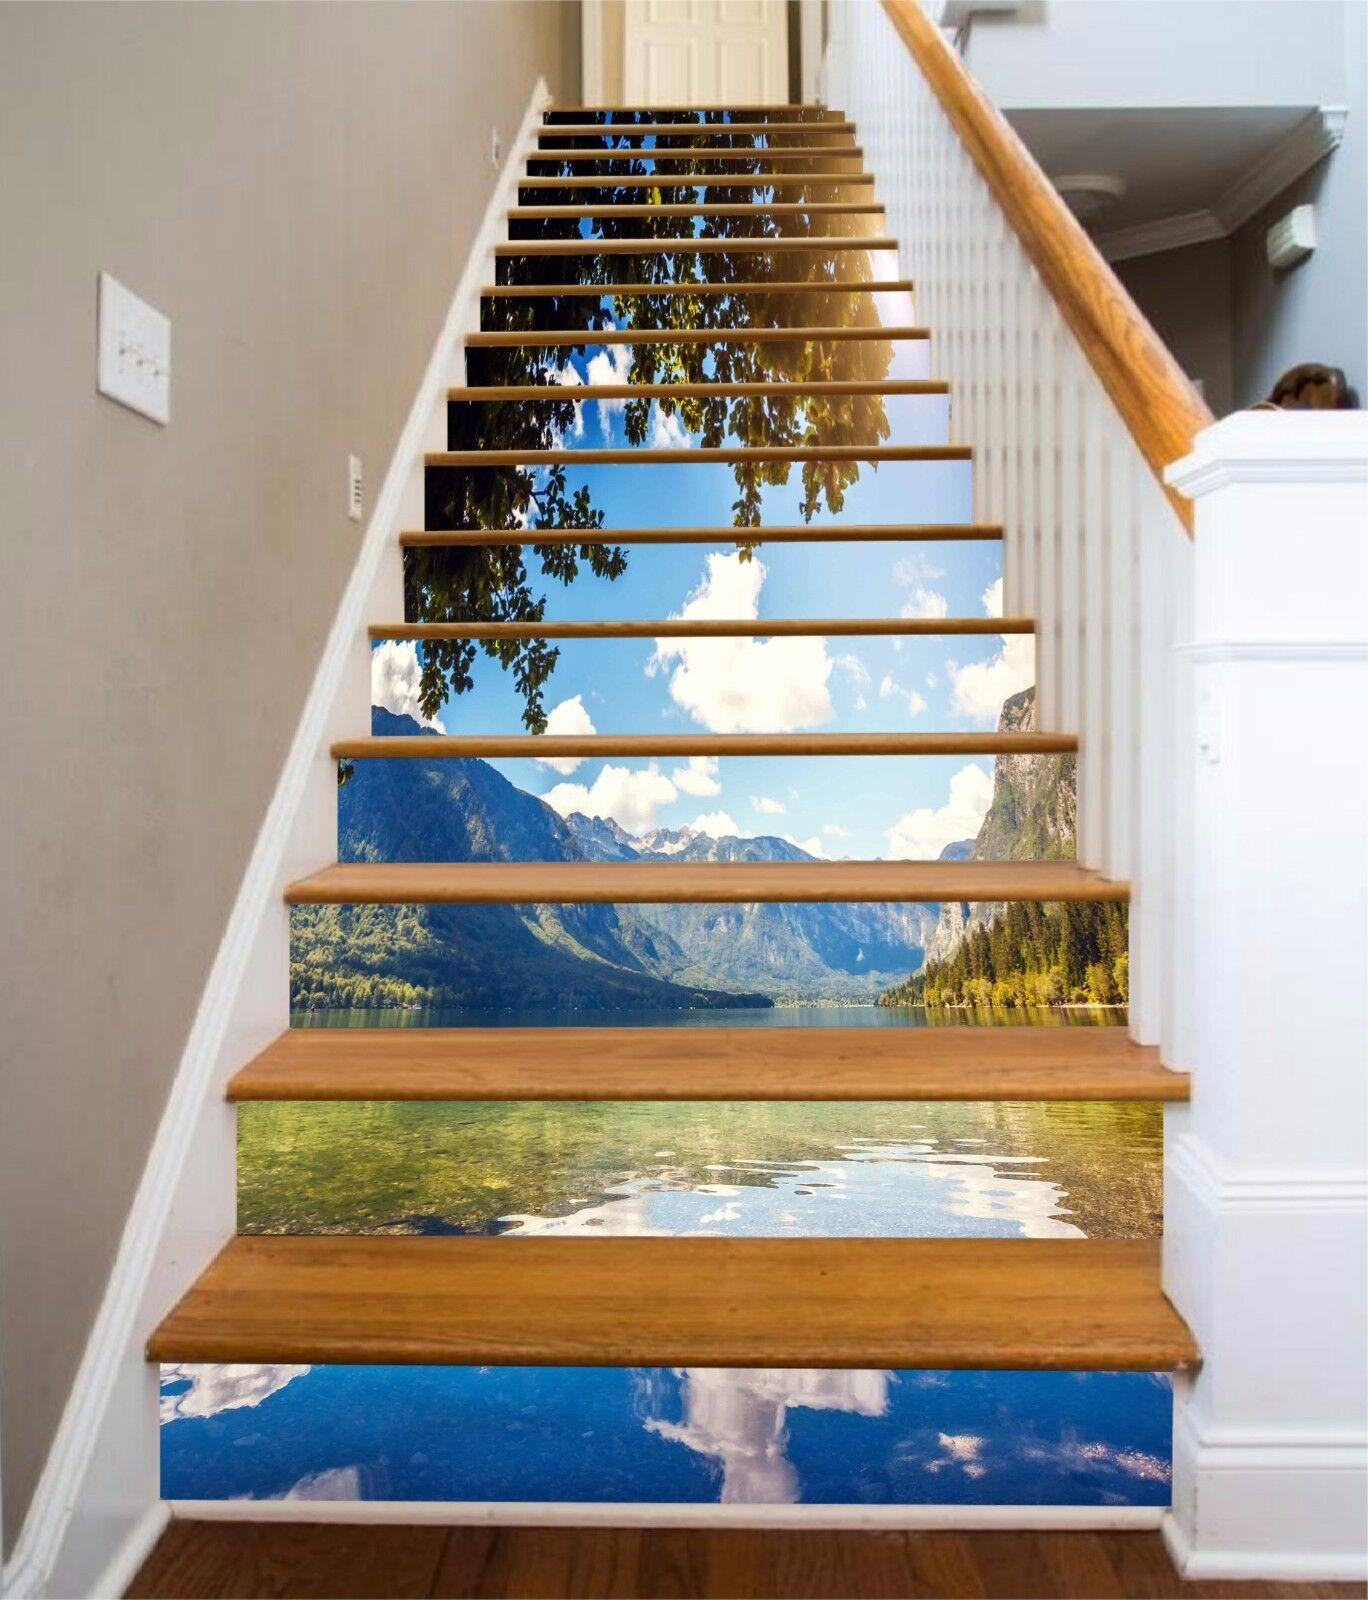 3D Sky snow 757 Stair Risers Decoration Photo Mural Vinyl Decal Wallpaper UK